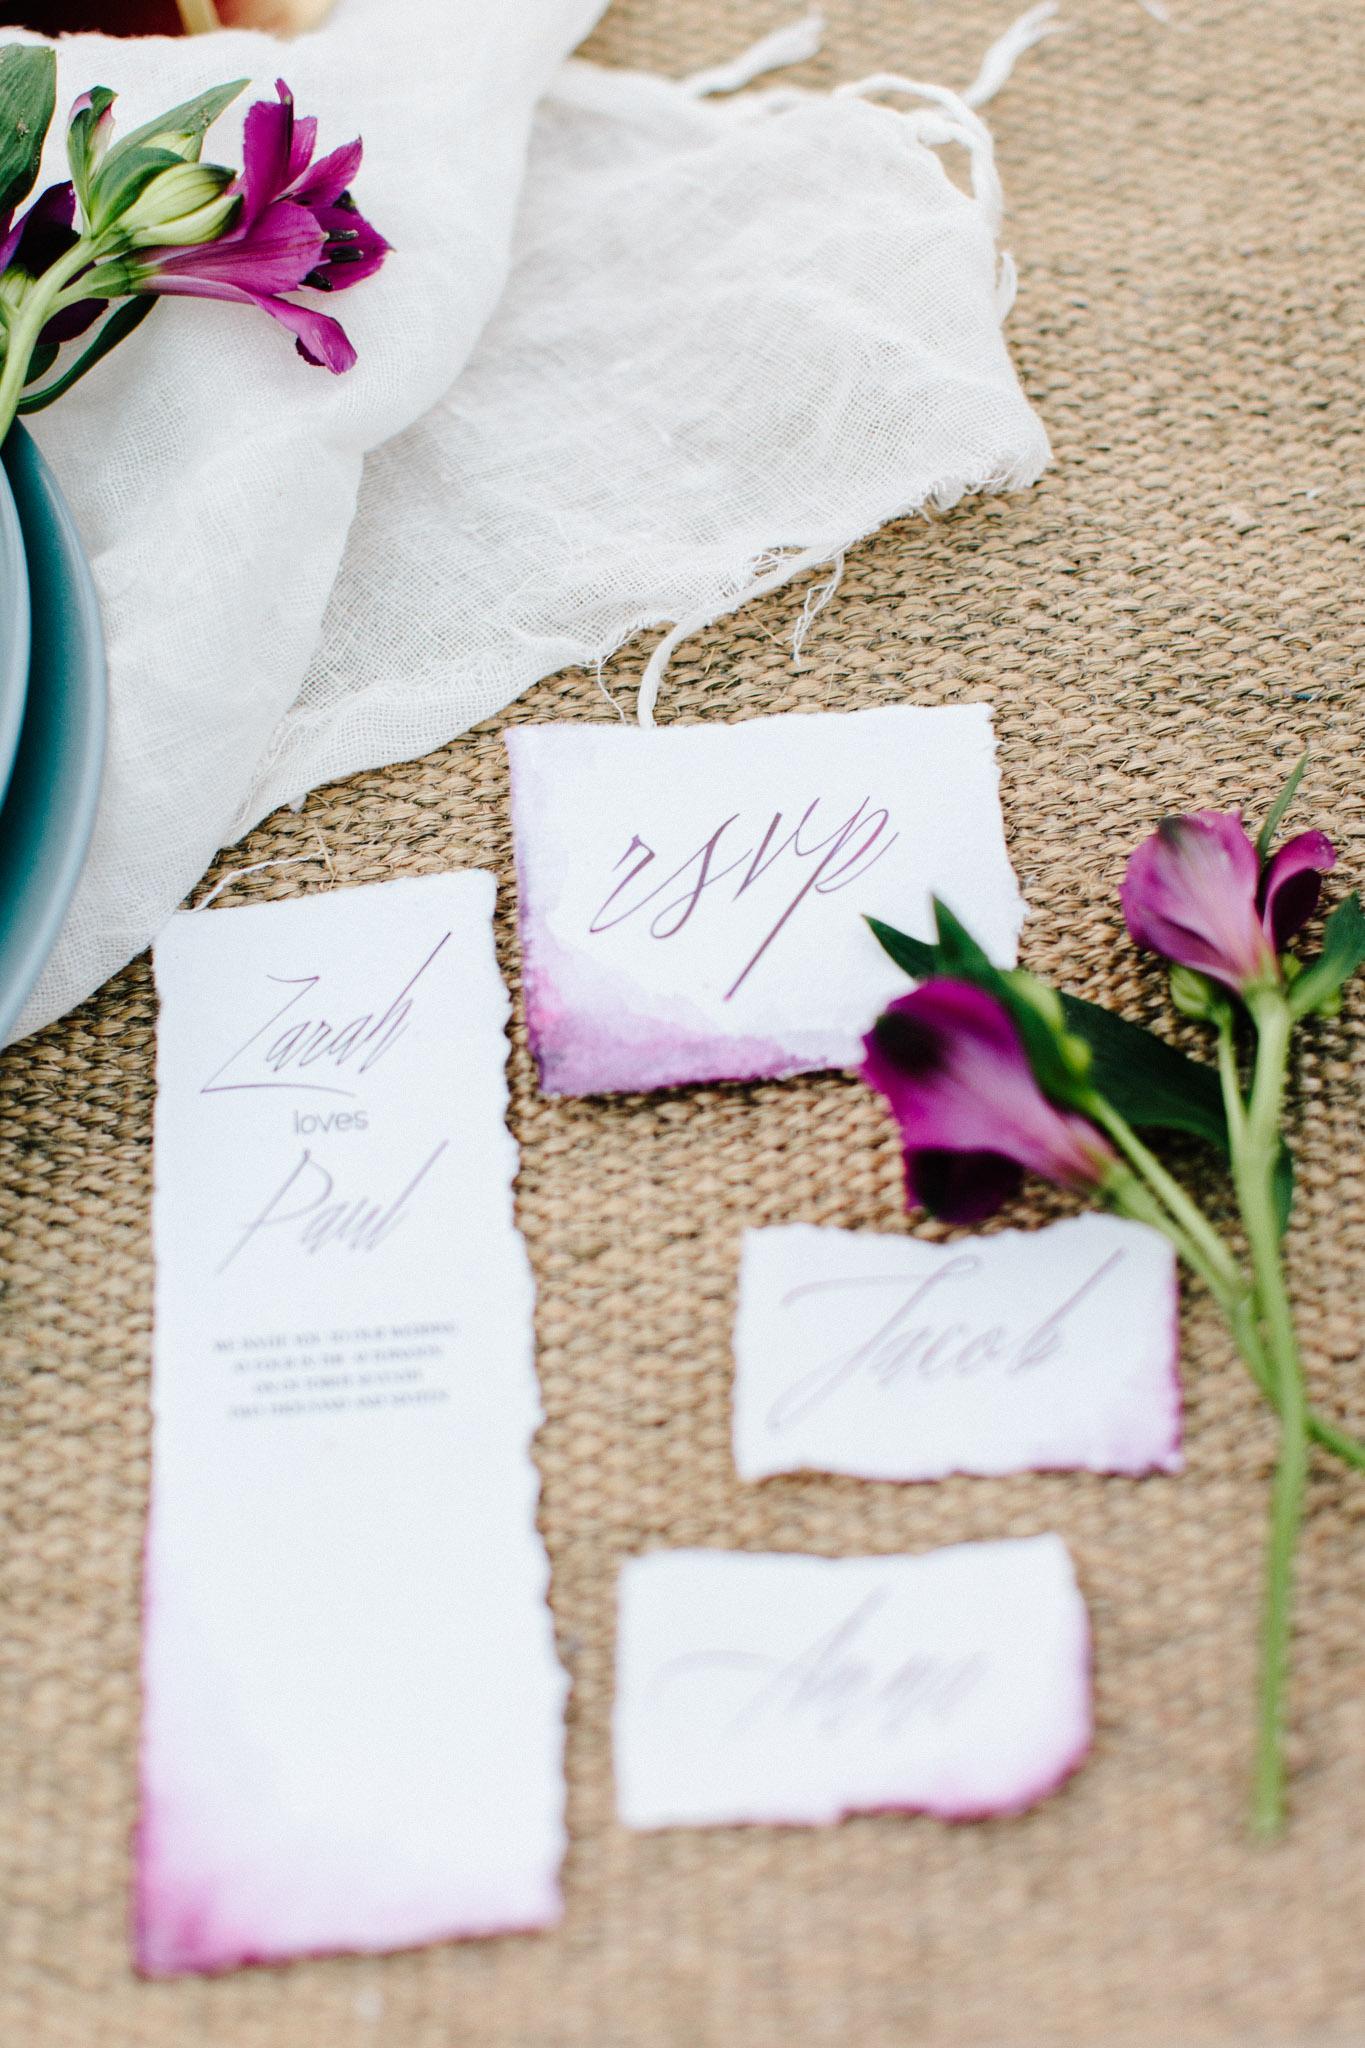 Speyer-Moroccan-Wedding-Inspiration-Pia-Anna-Christian-Wedding-Photography-S-48.jpg